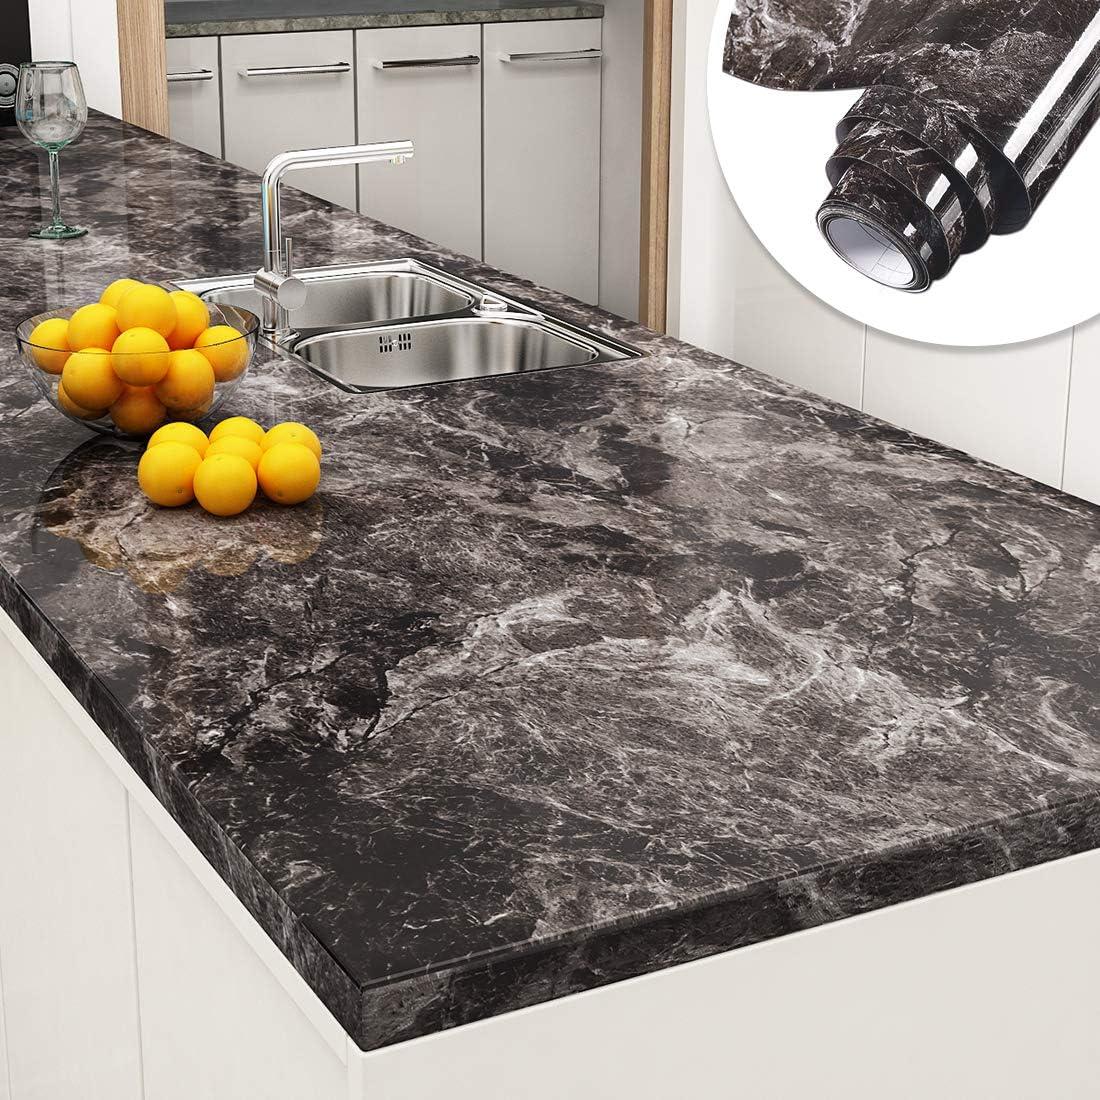 Yenhome Countertop Contact Paper 60cm x 5m Sandstone Black Granite ...